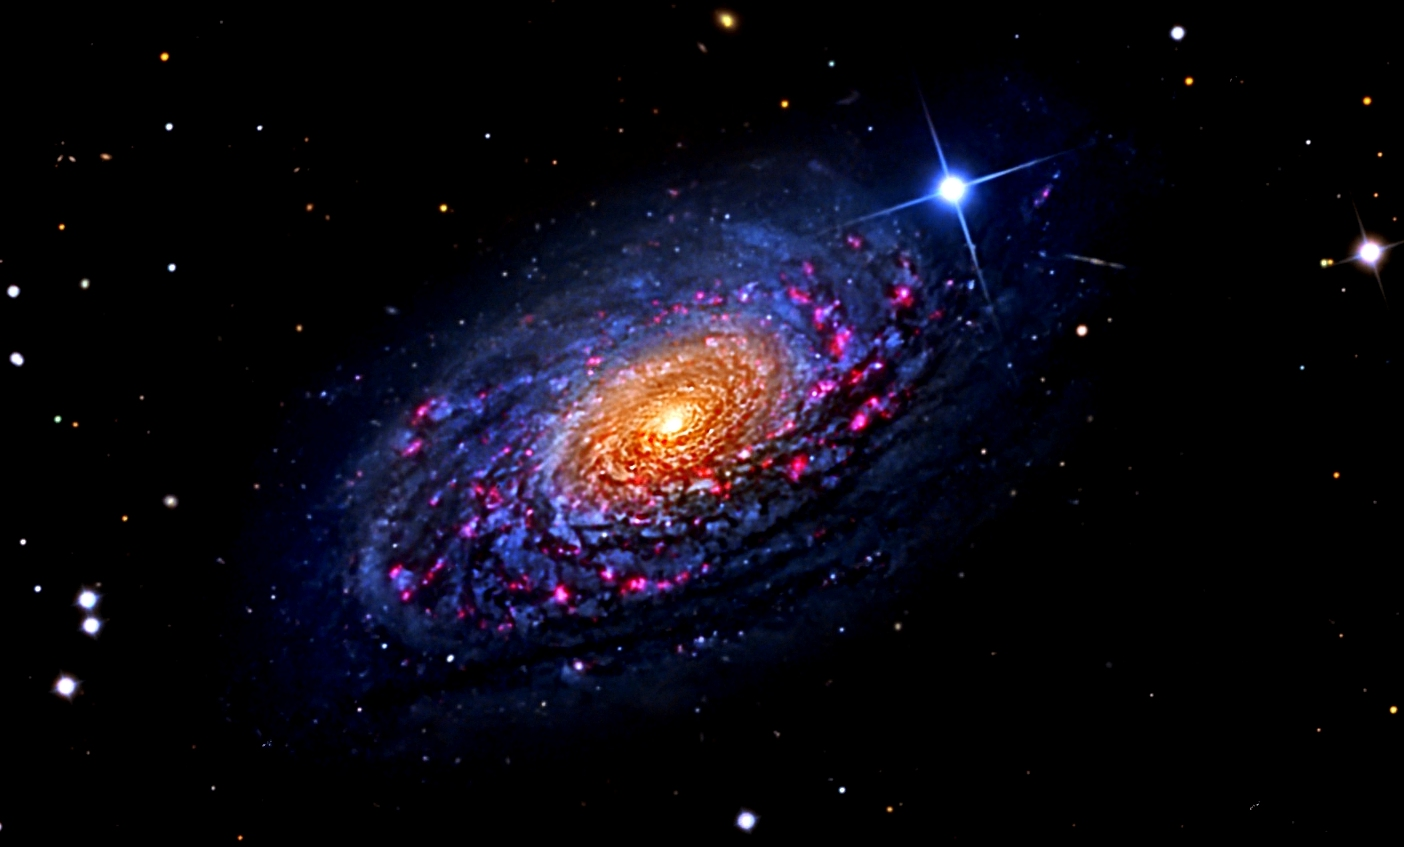 UFO WORLD: NASA Images M63 The Sunflower Galaxy